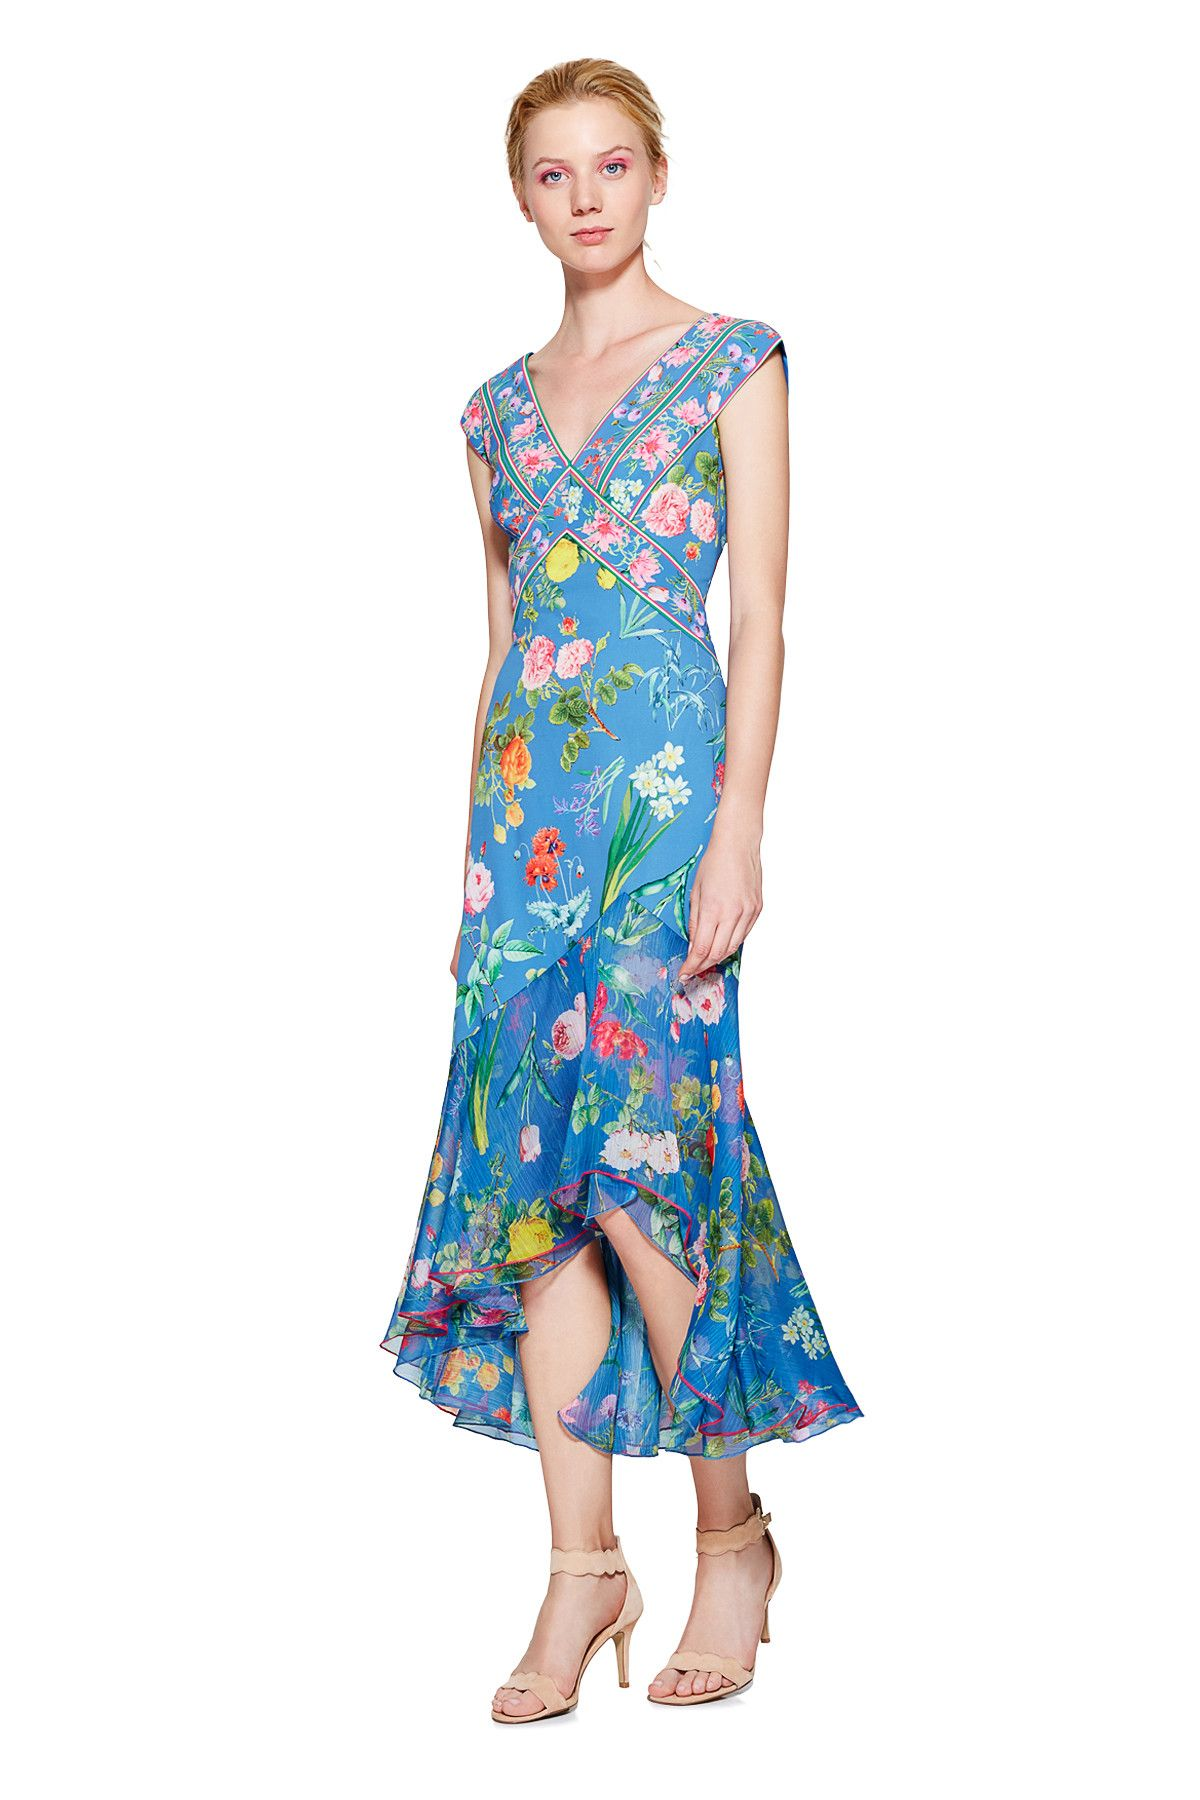 Tadashi Shoji - Clara High-Low Dress   Dress   Pinterest